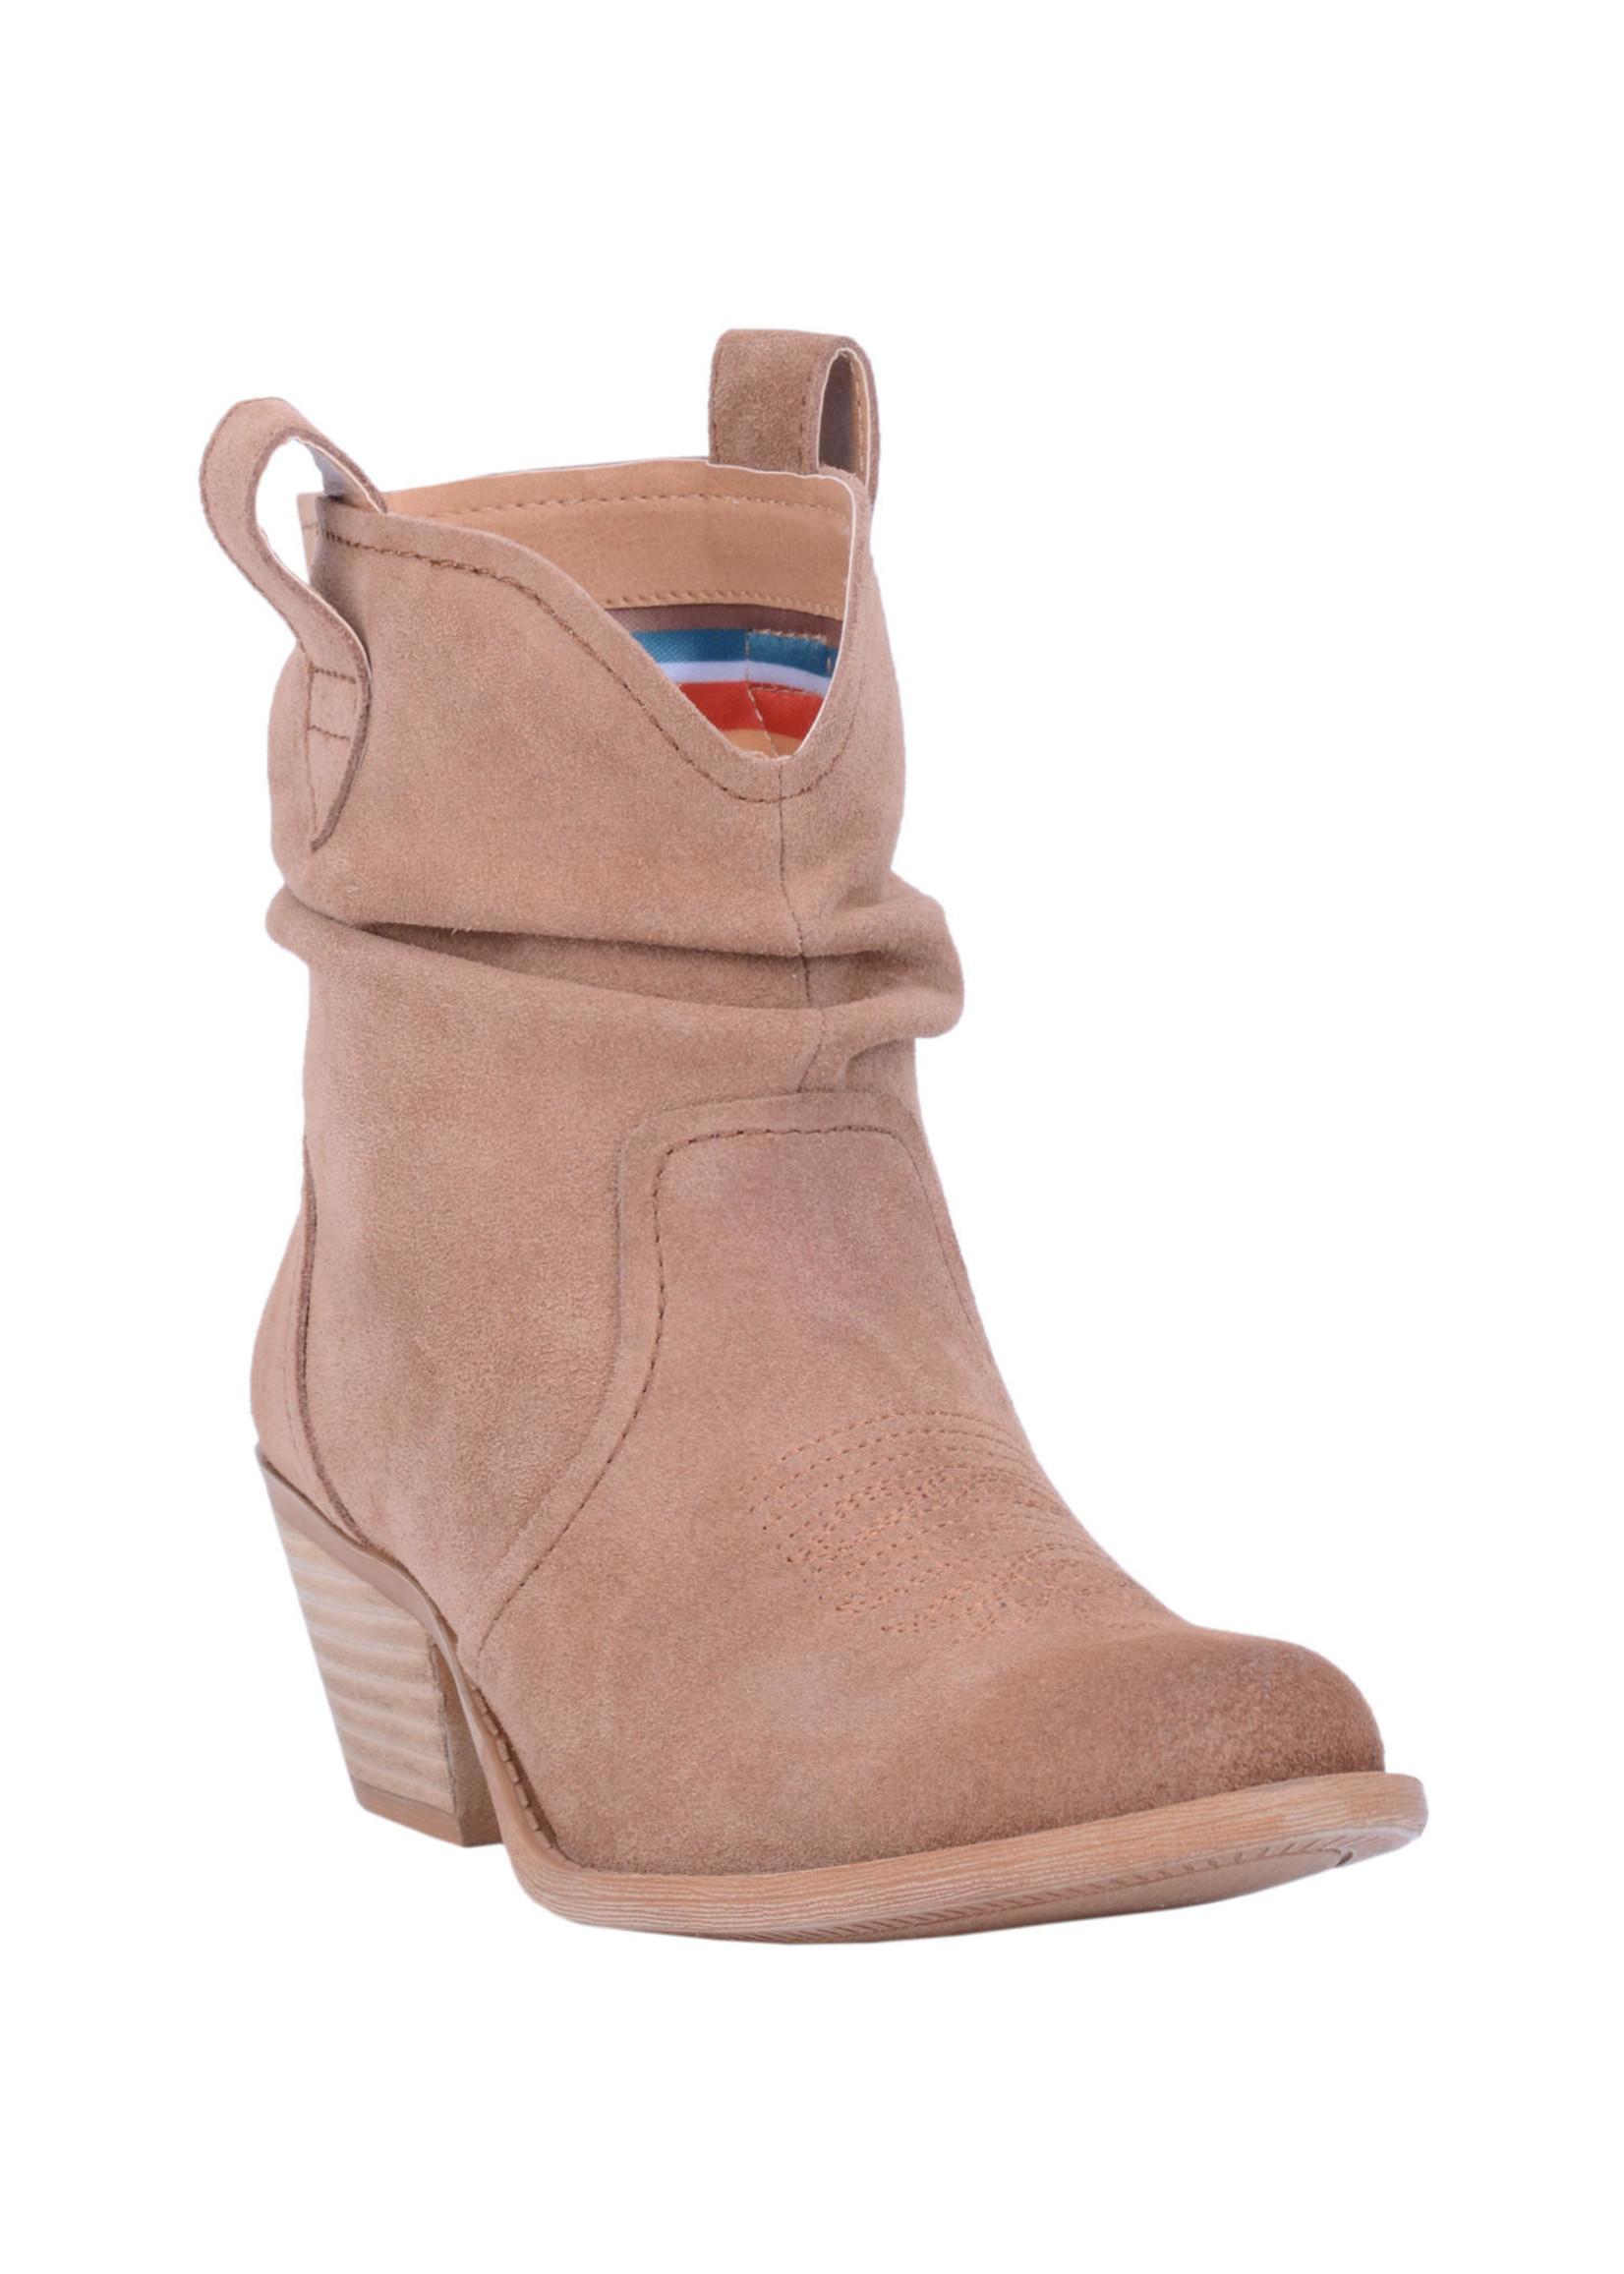 Dingo Women's Jackpot Slouch Ankle Bootie DI132